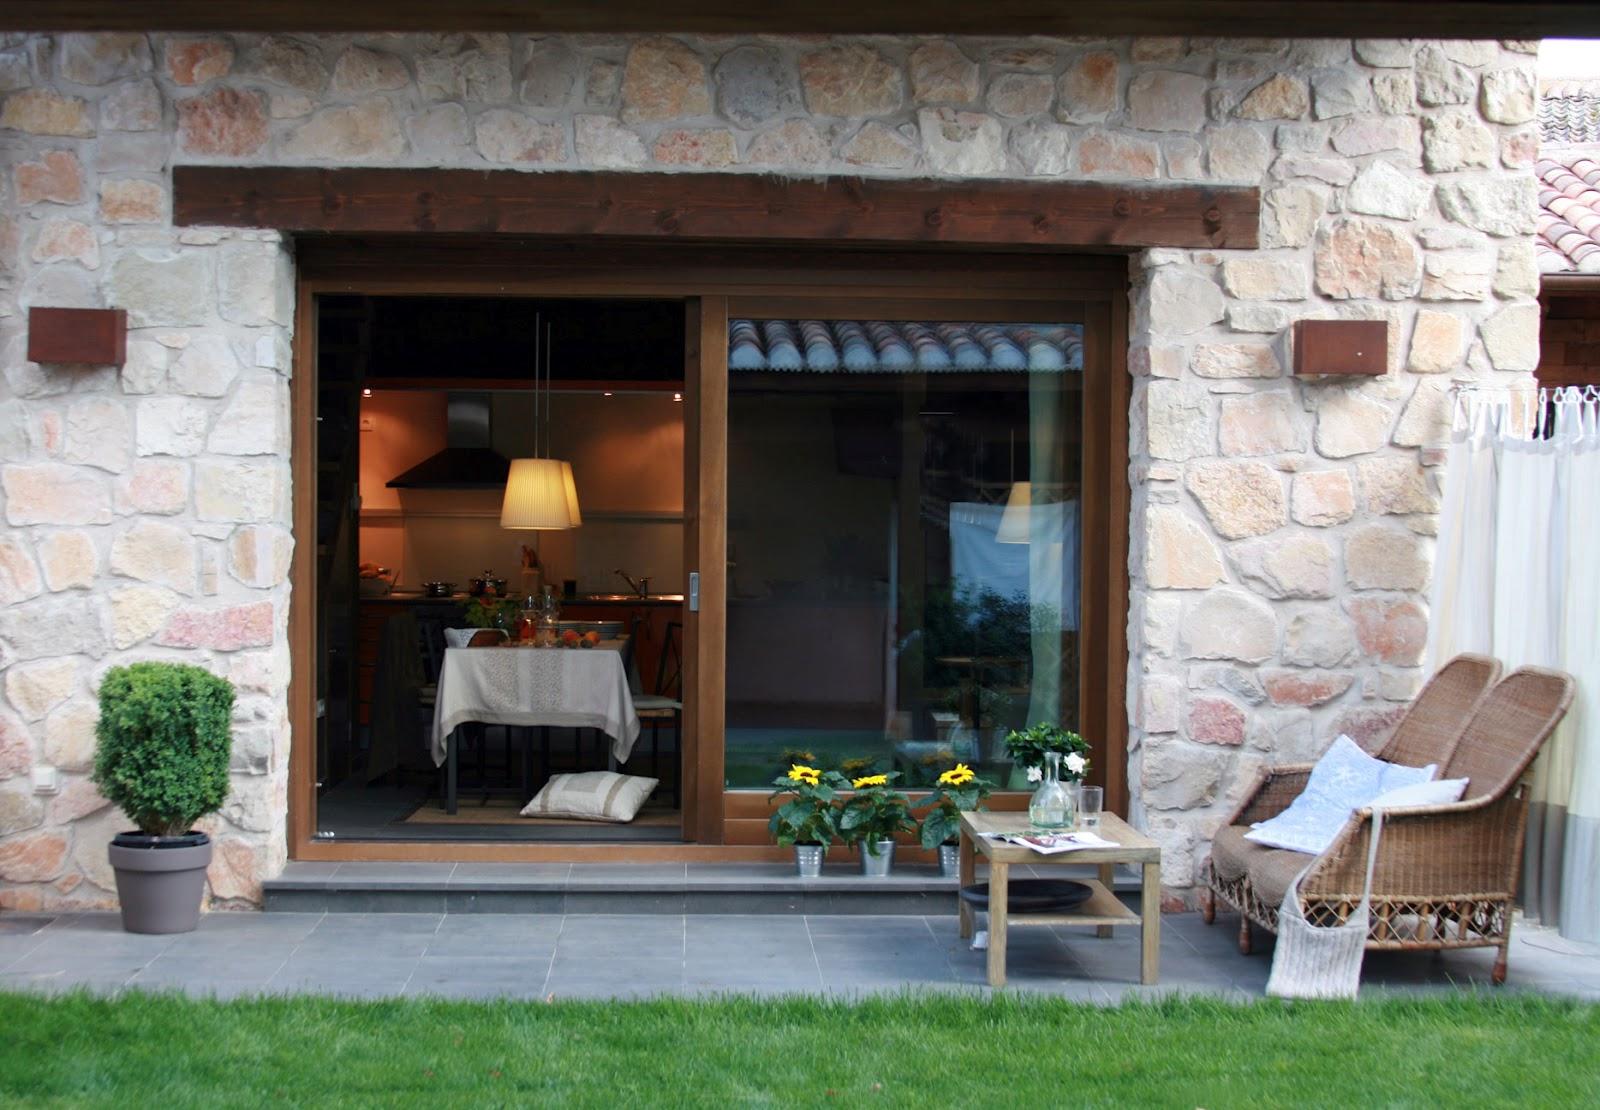 Casa rural con encanto en pedraza segovia - Casas con encanto asturias ...